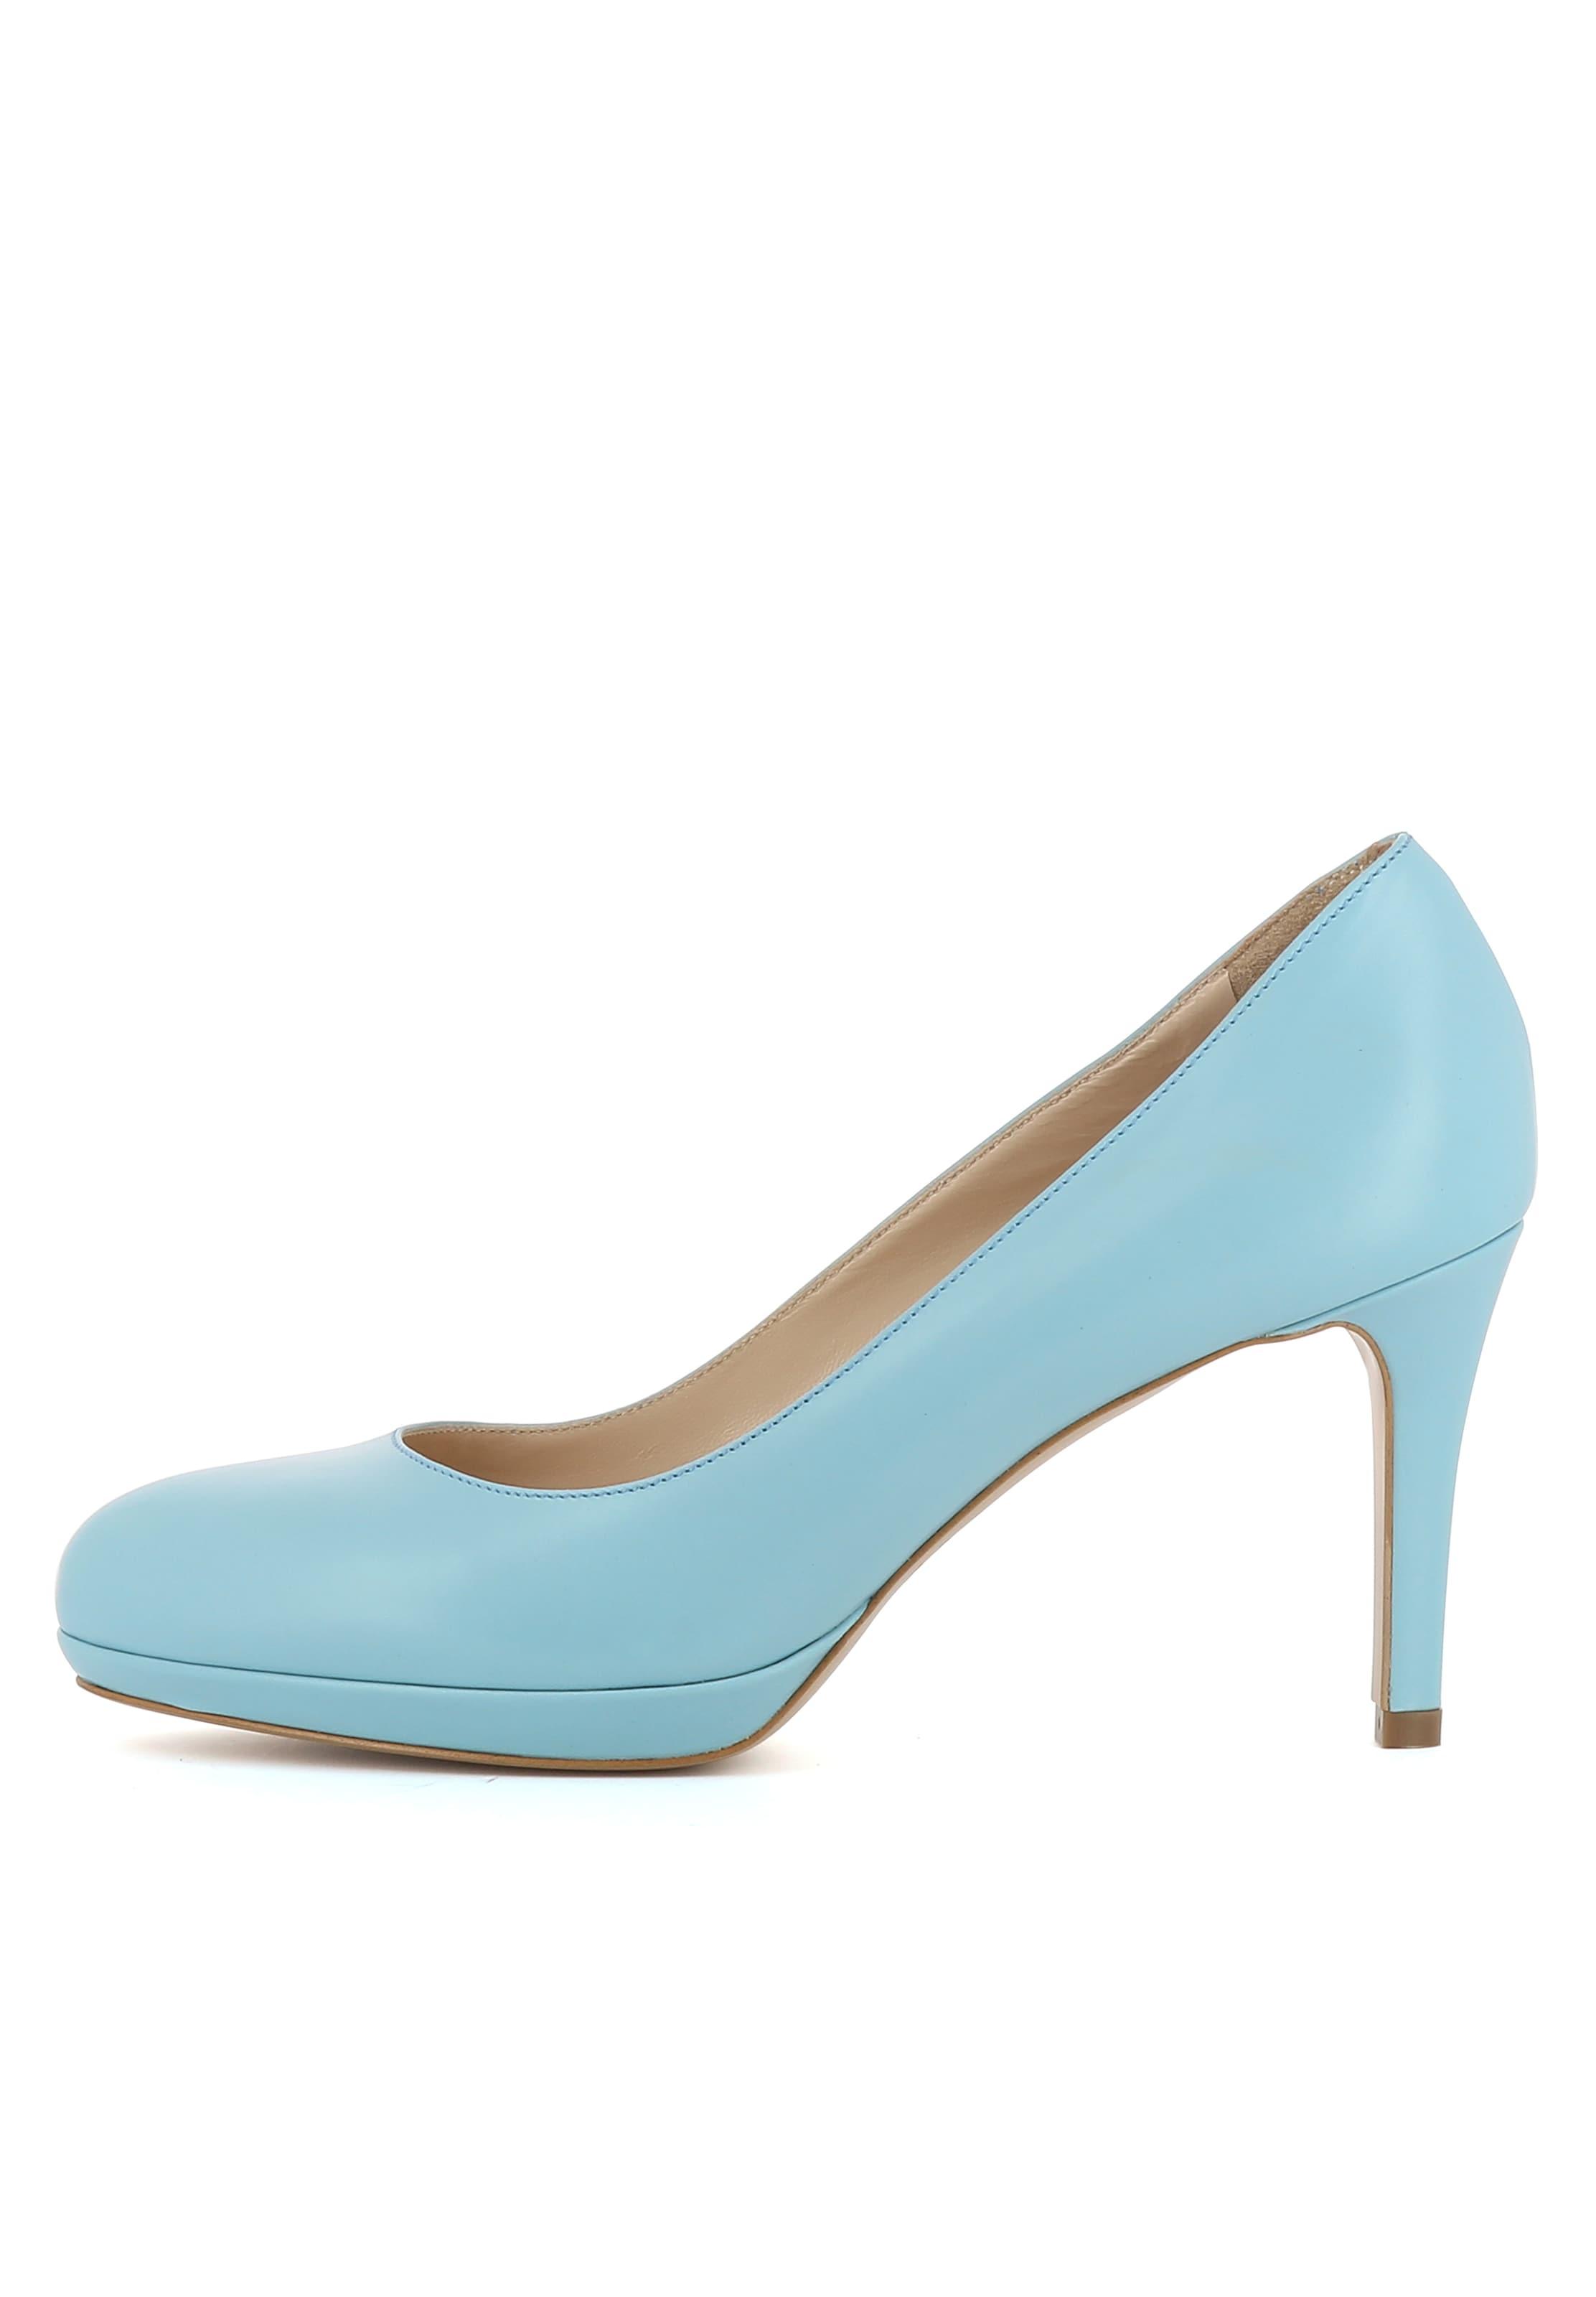 Evita Pumps Damen Damen In Hellblau Evita tsdCxrQh